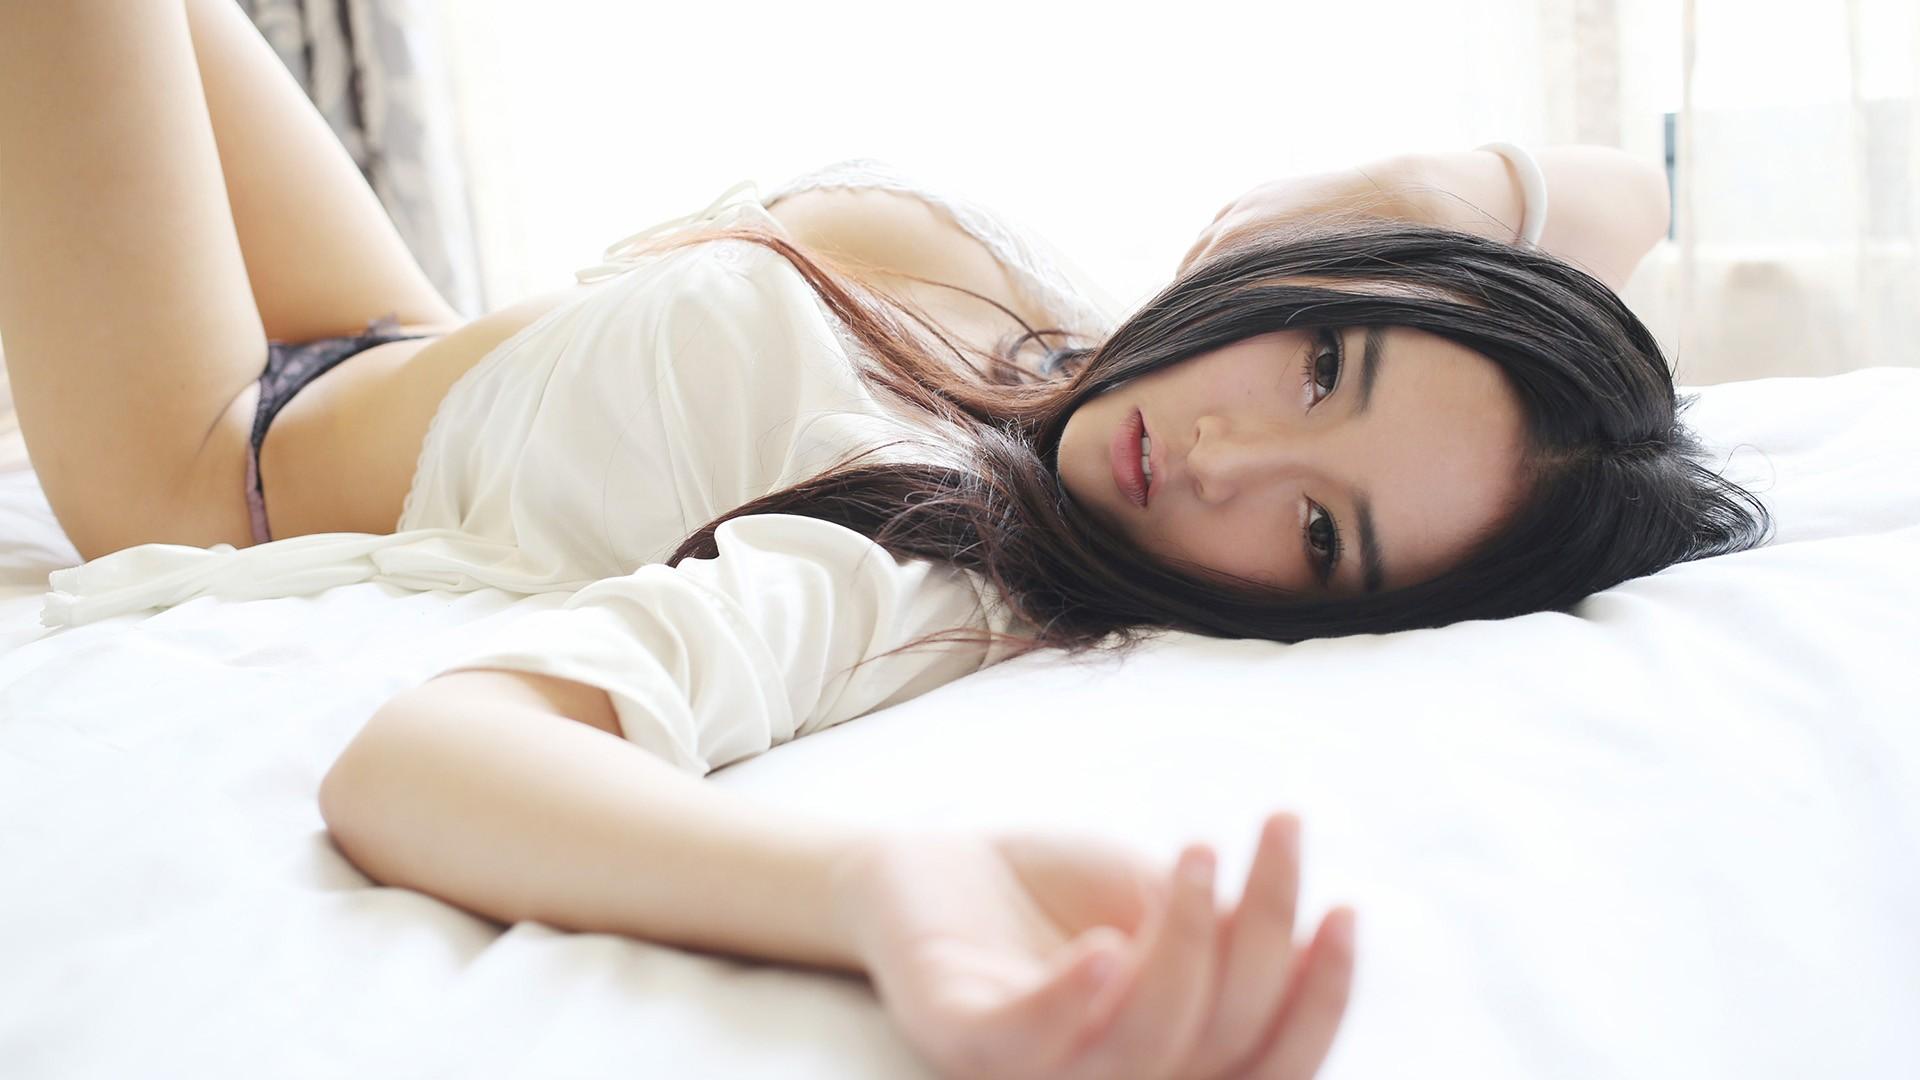 Красивая азиатка на кровати со своим парнем видео — pic 1